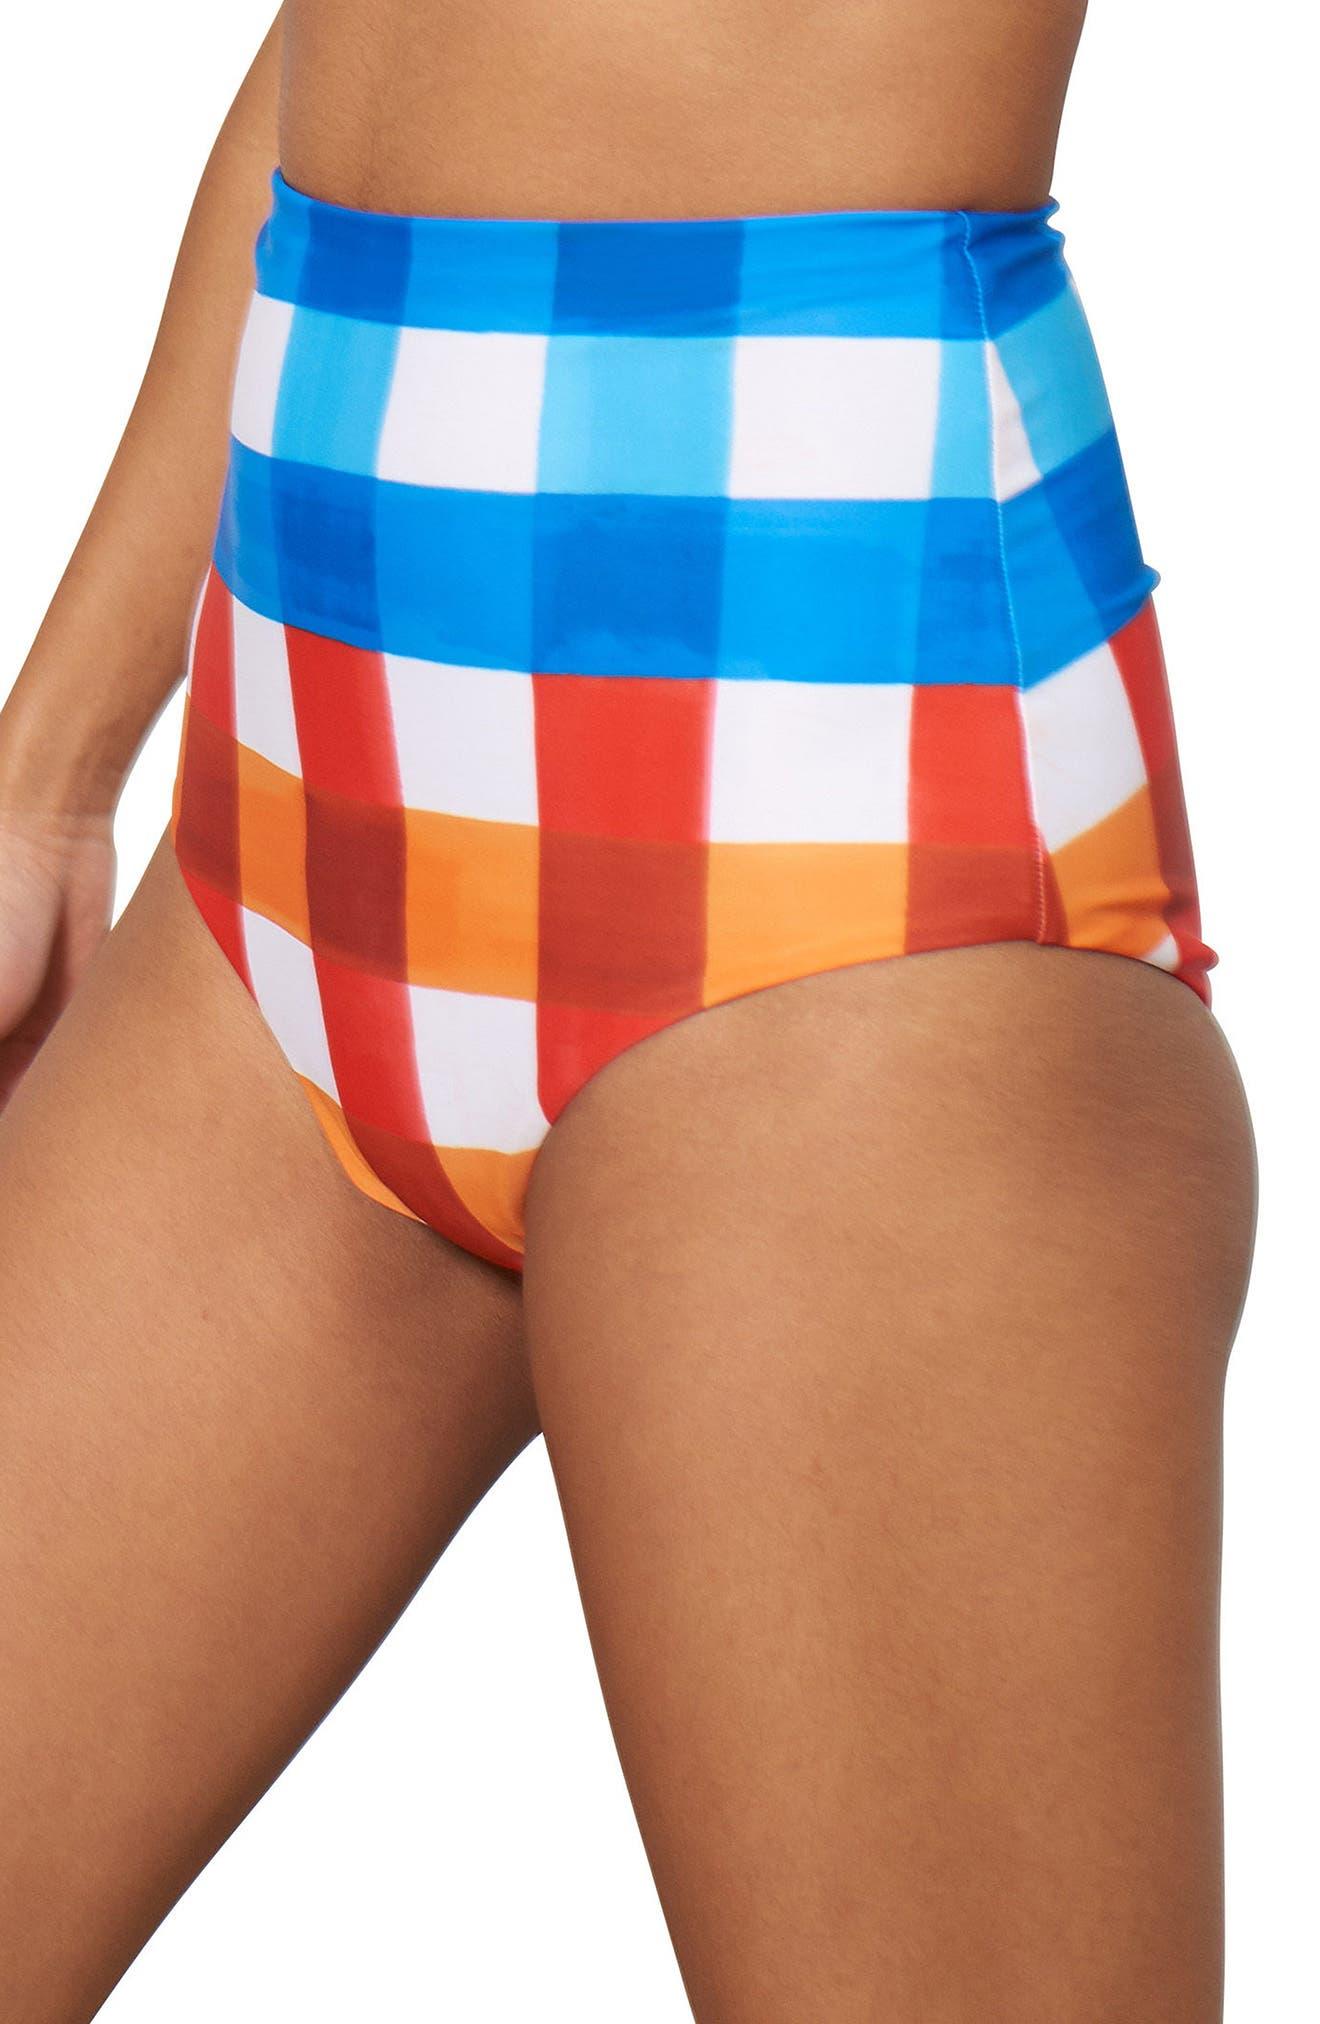 Lydia High Waist Bikini Bottoms,                             Alternate thumbnail 3, color,                             RED/ BLUE MULTI